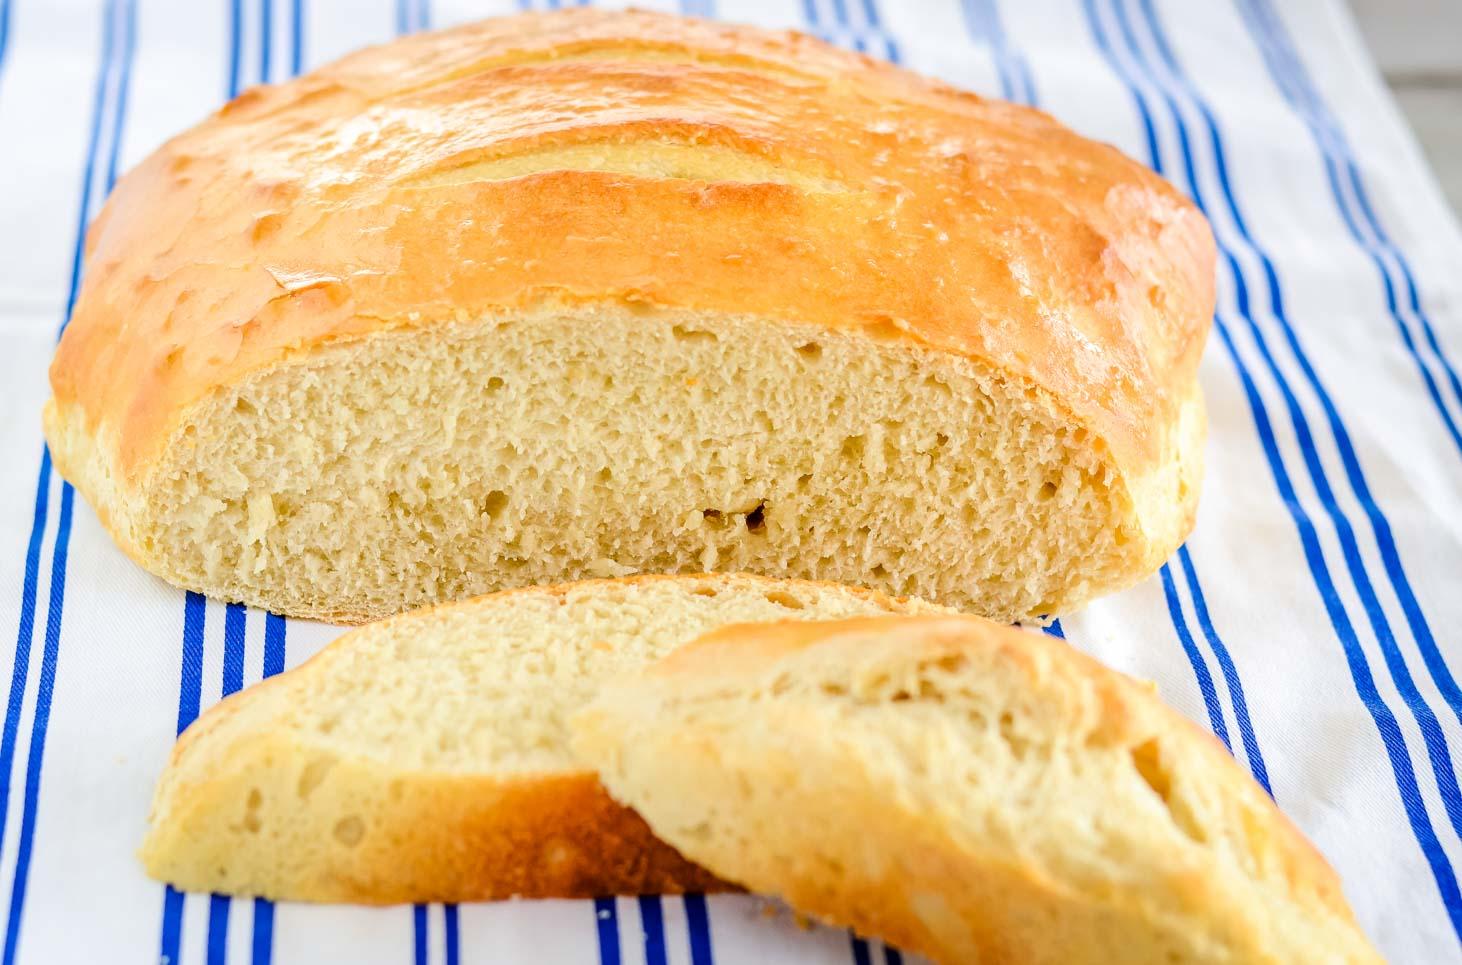 Cut loaf of sourdough bread